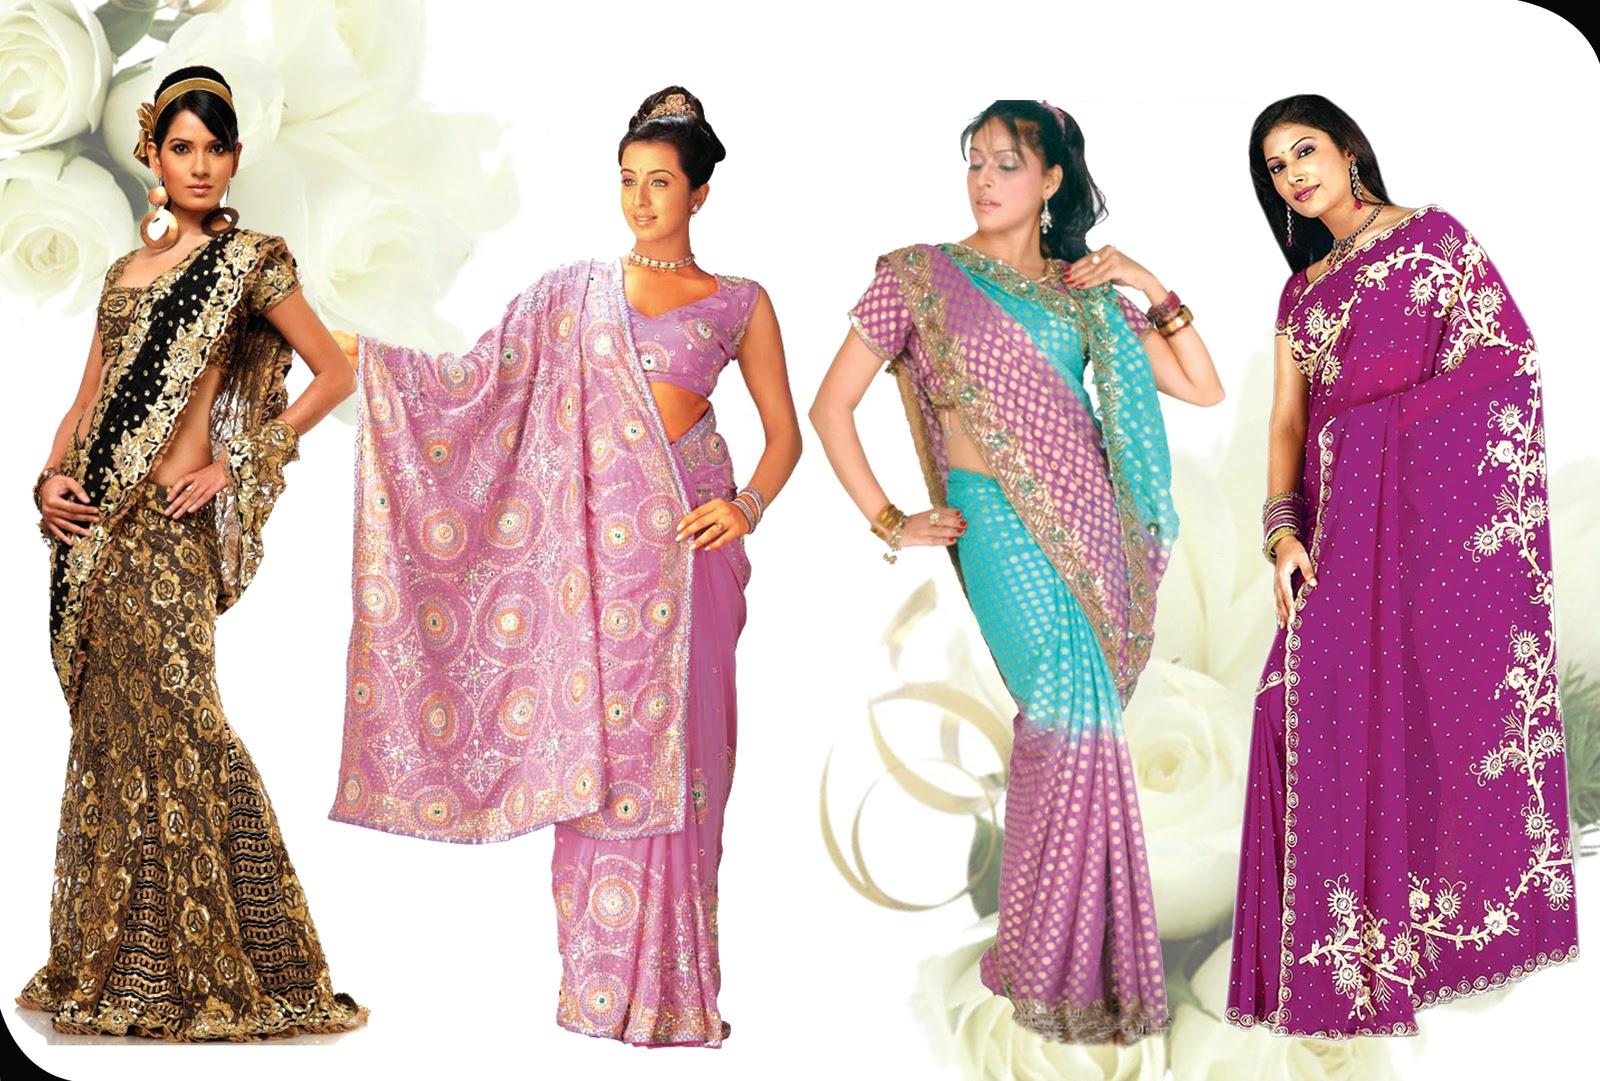 Fashion Sarees Designes Photoshop Creation